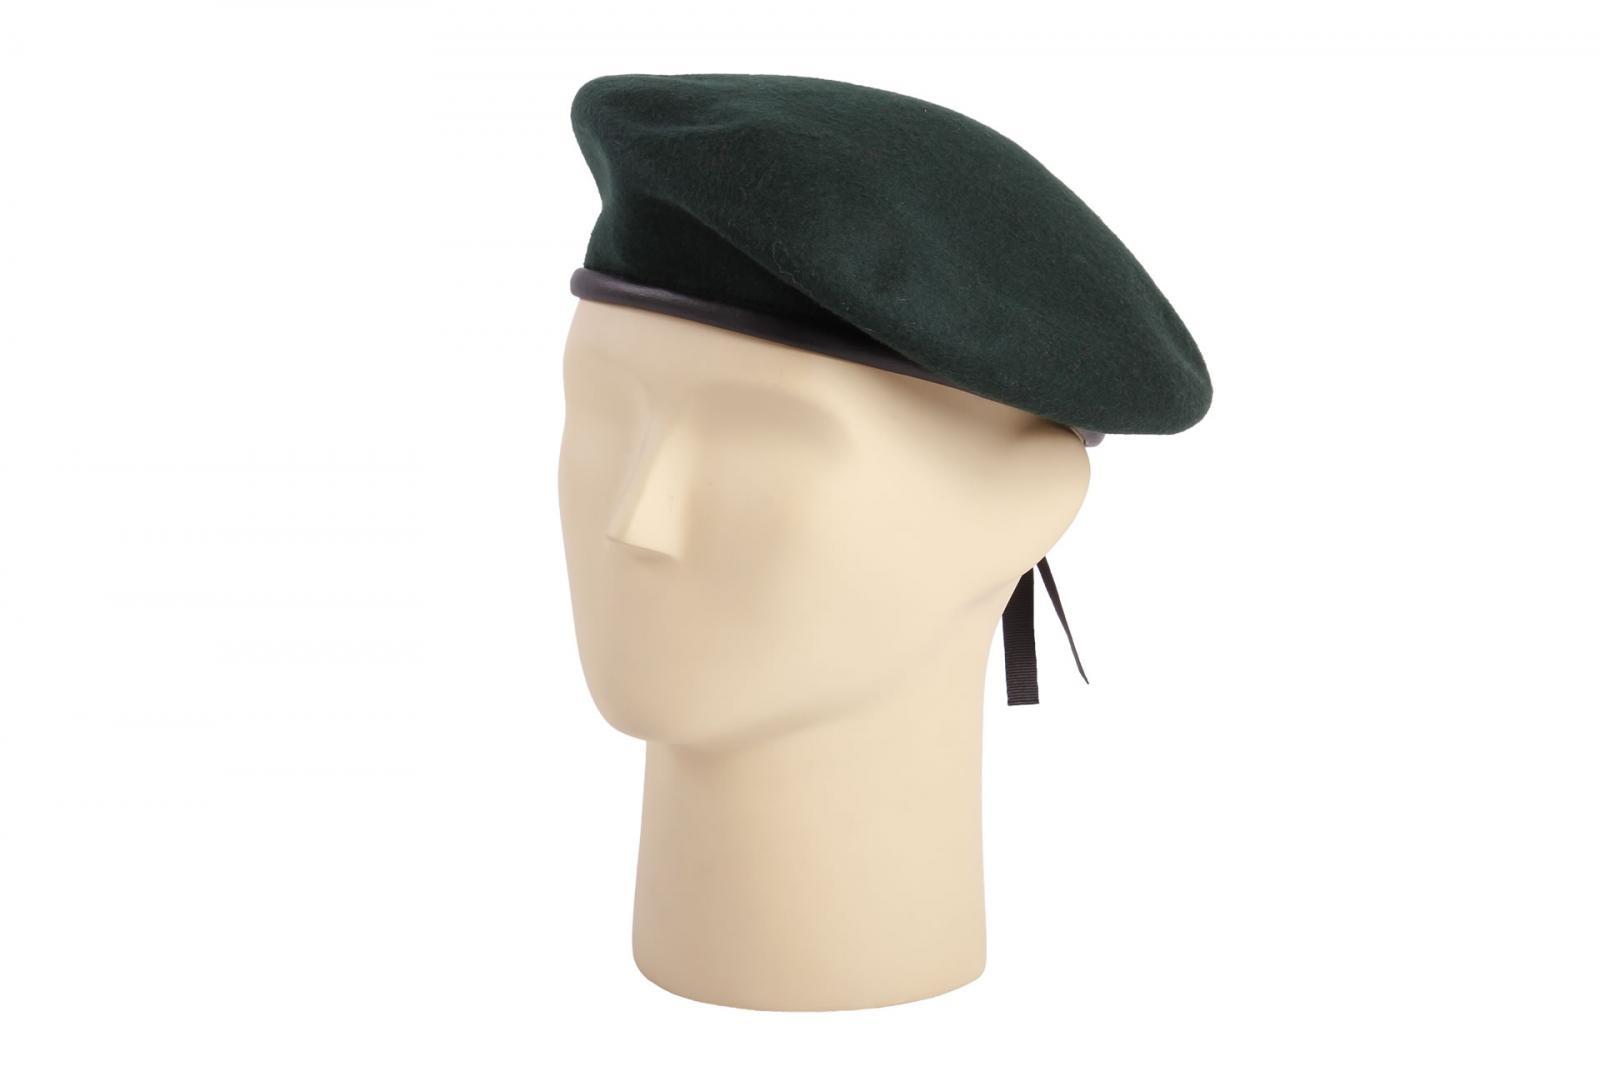 366770cded7bb Boina Militar  Boina Militar ...